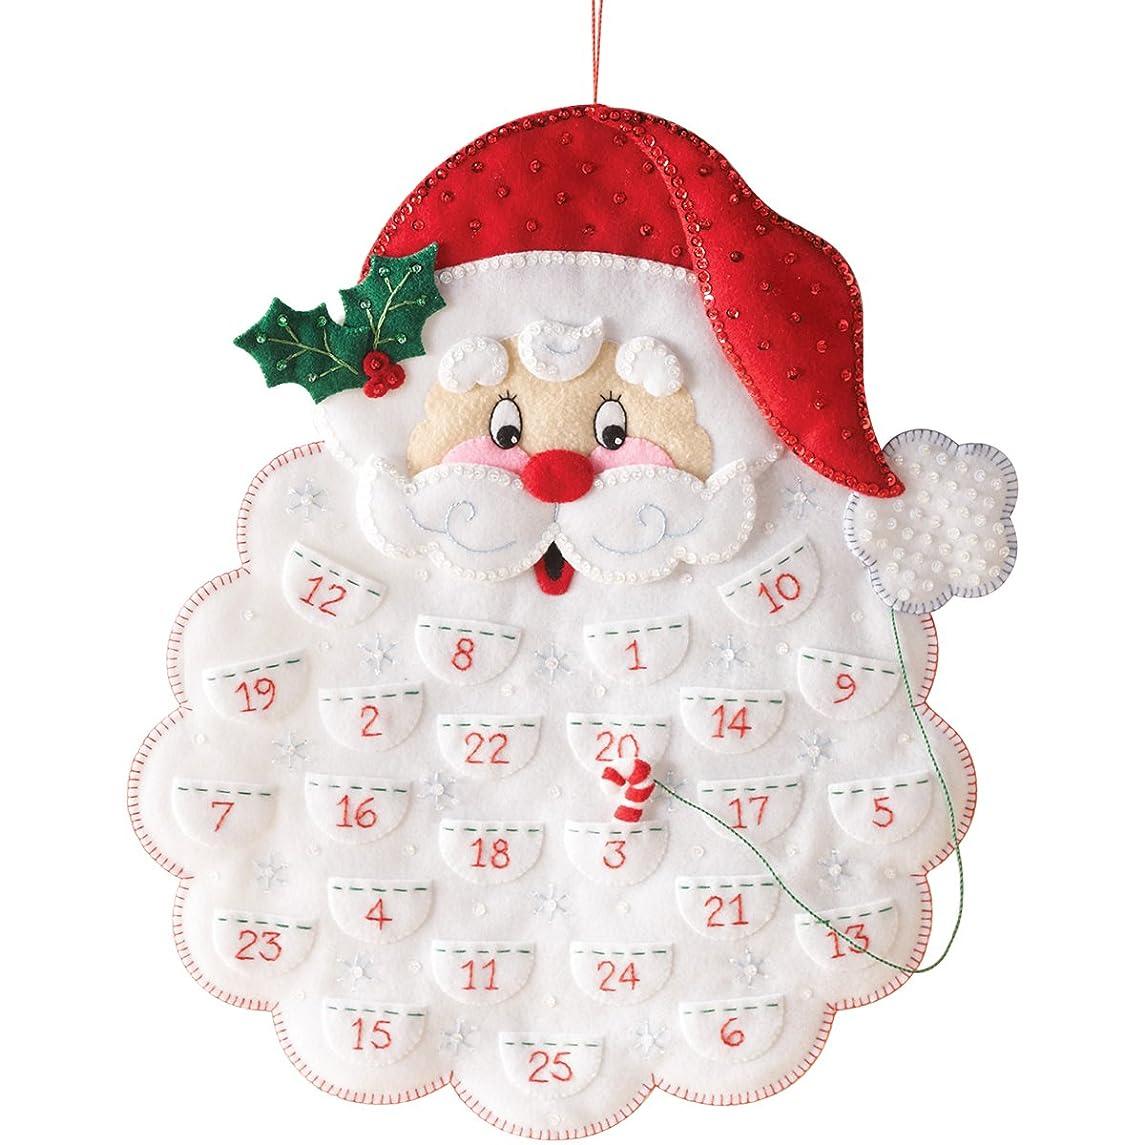 Bucilla Felt Applique Advent Calendar Kit, 14.5 by 18-Inch, 86540 Santa